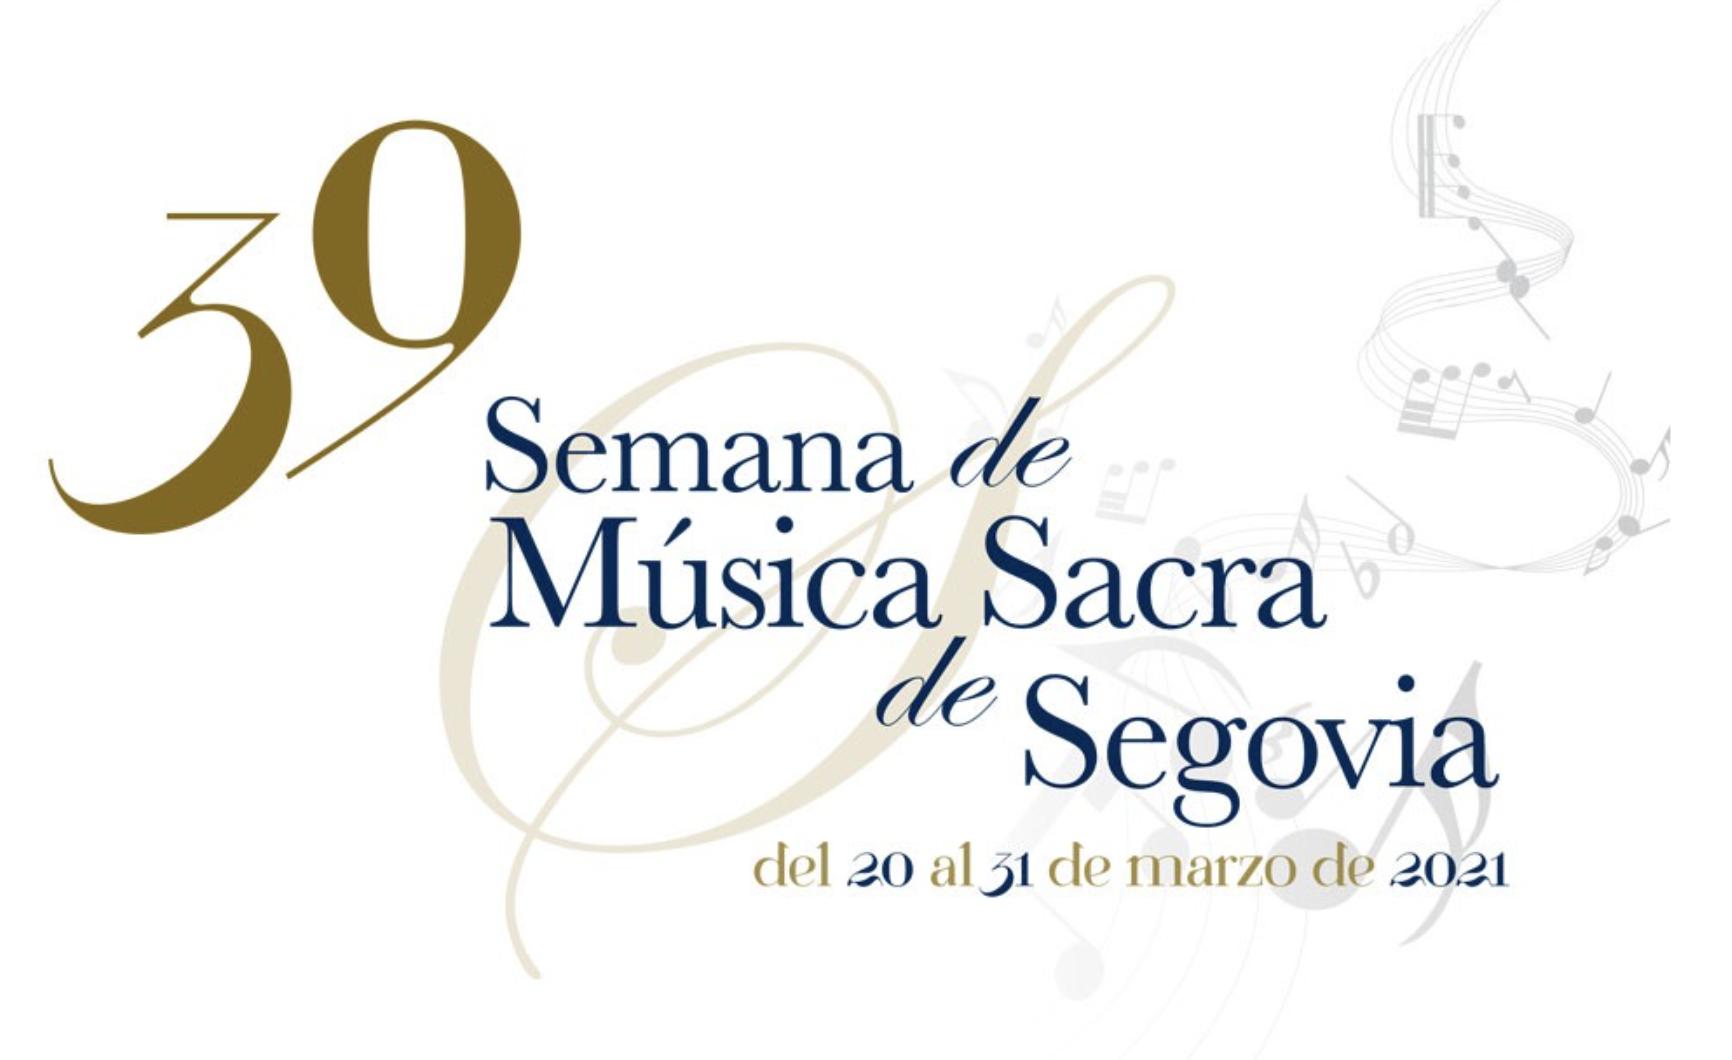 39ª edición de la Semana de Música Sacra de Segovia